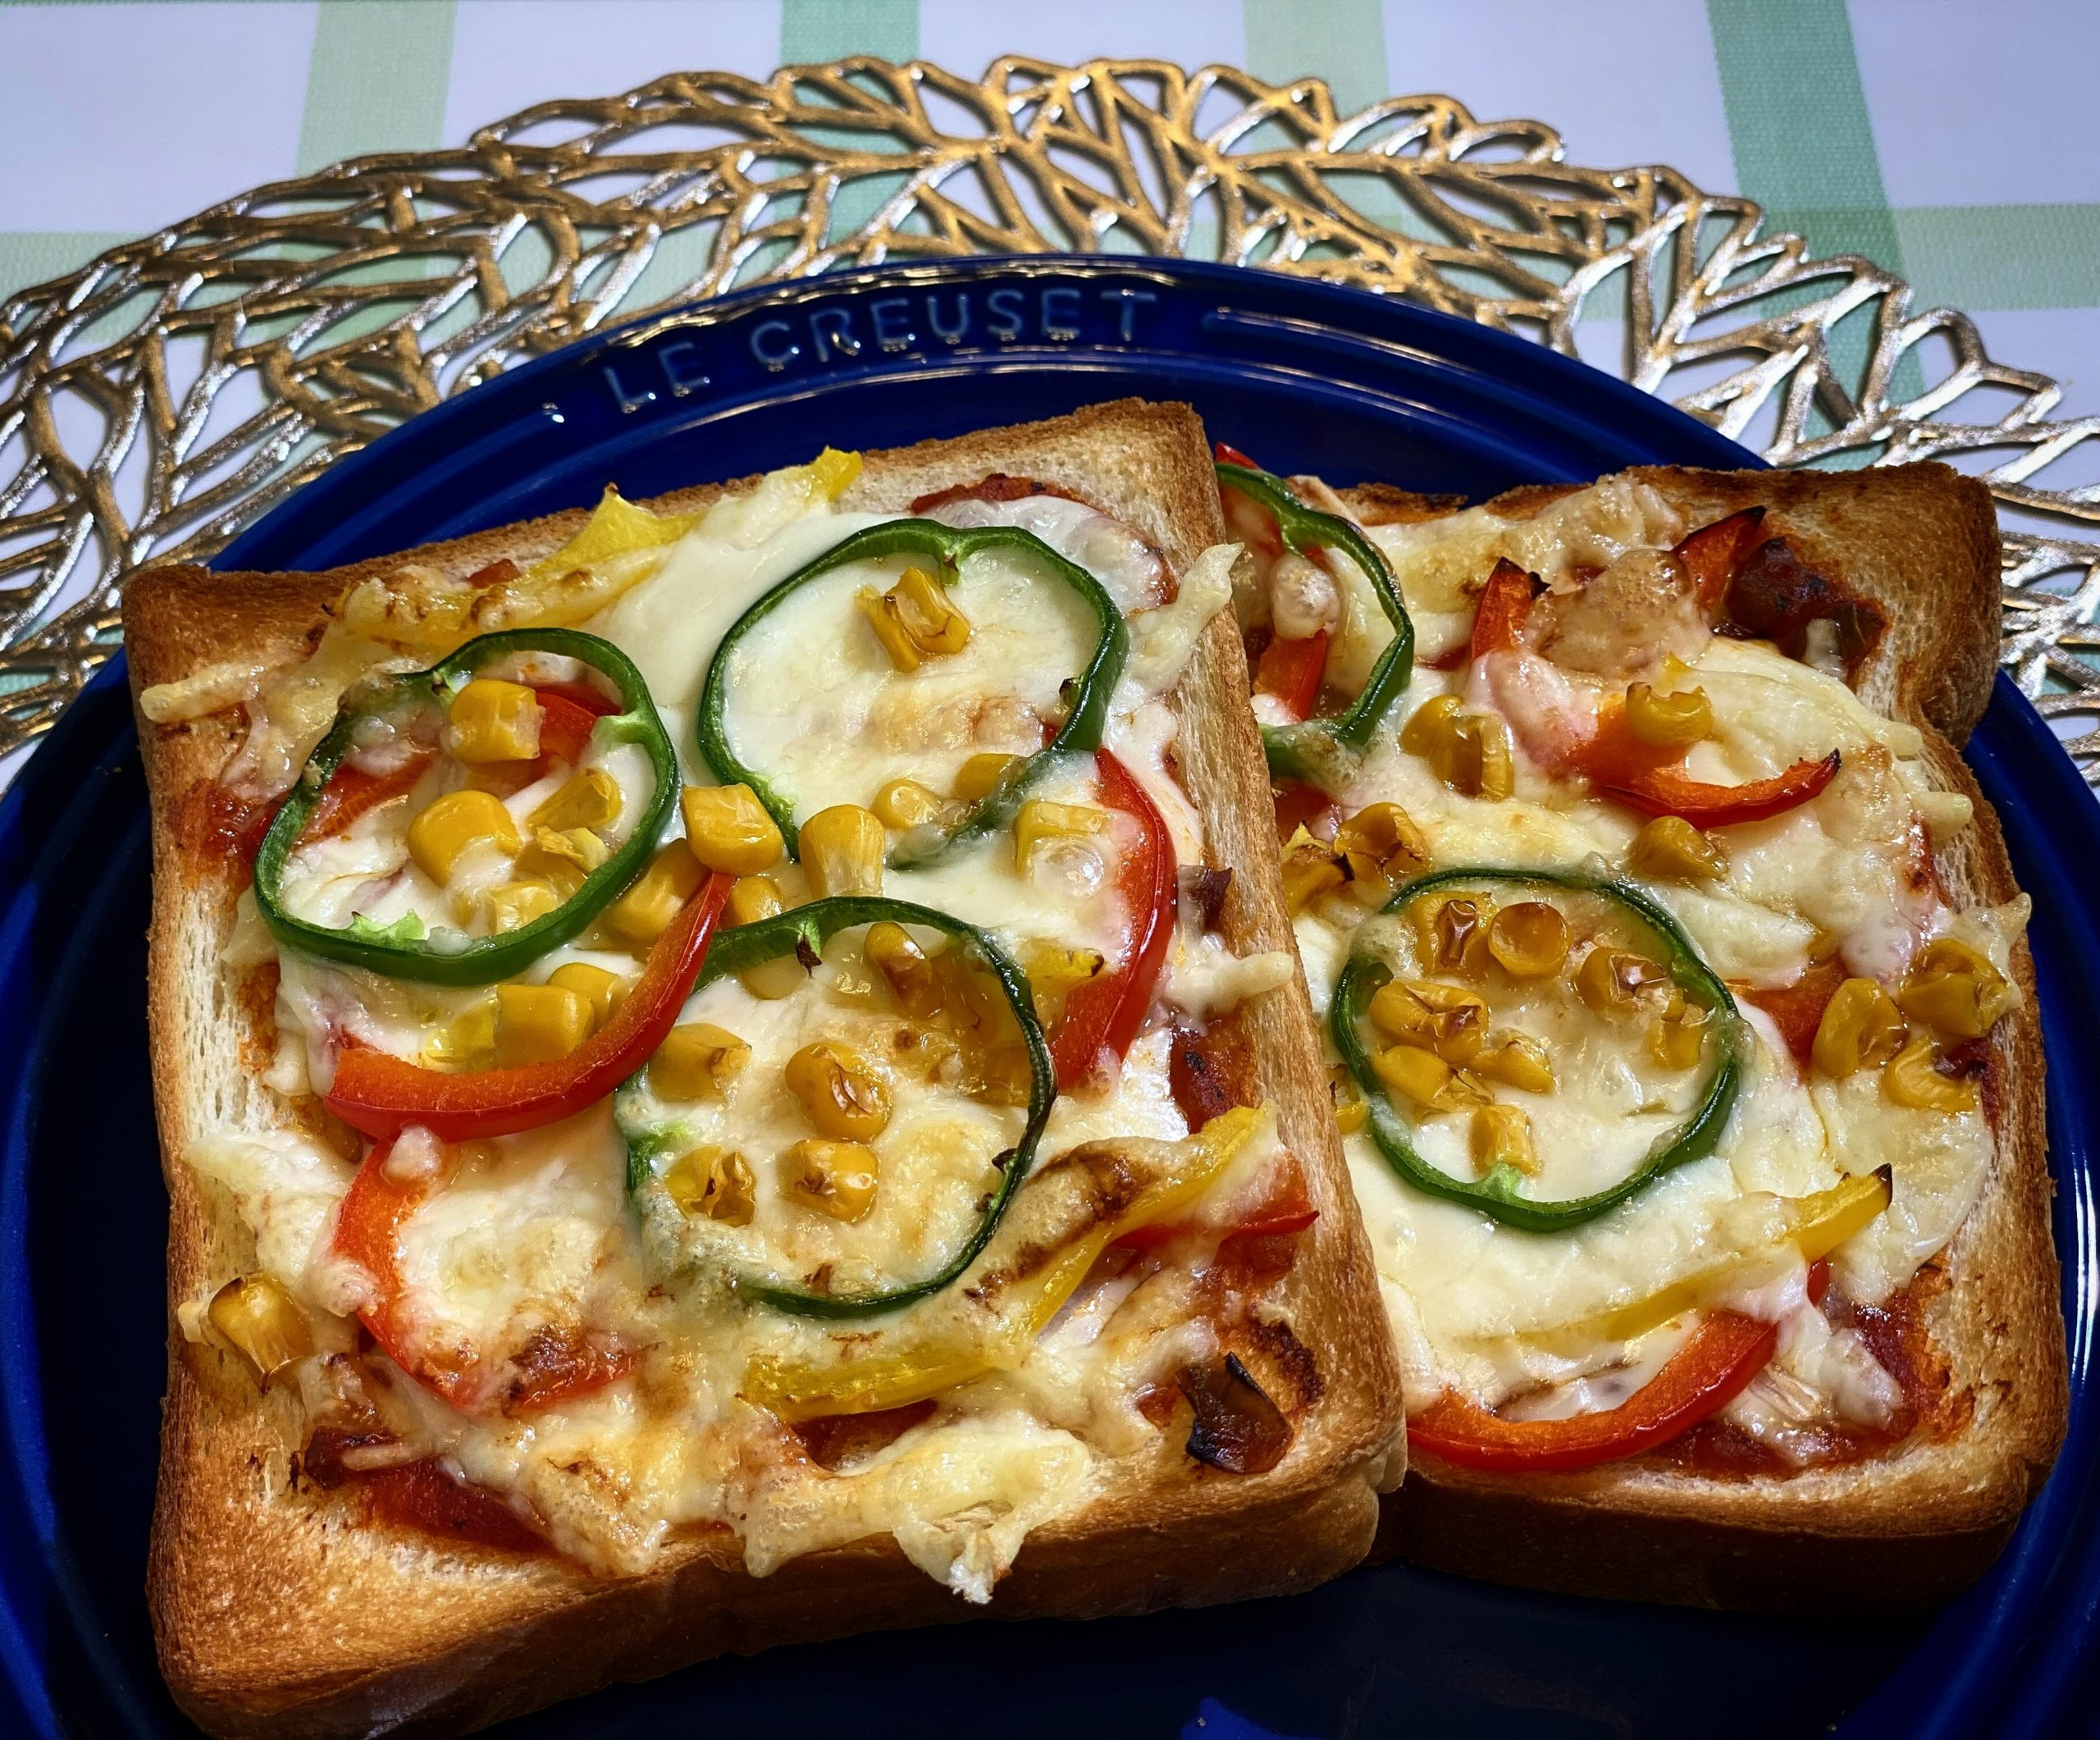 Olive家の簡単レシピ | 簡単で美味しい!ピザトースト